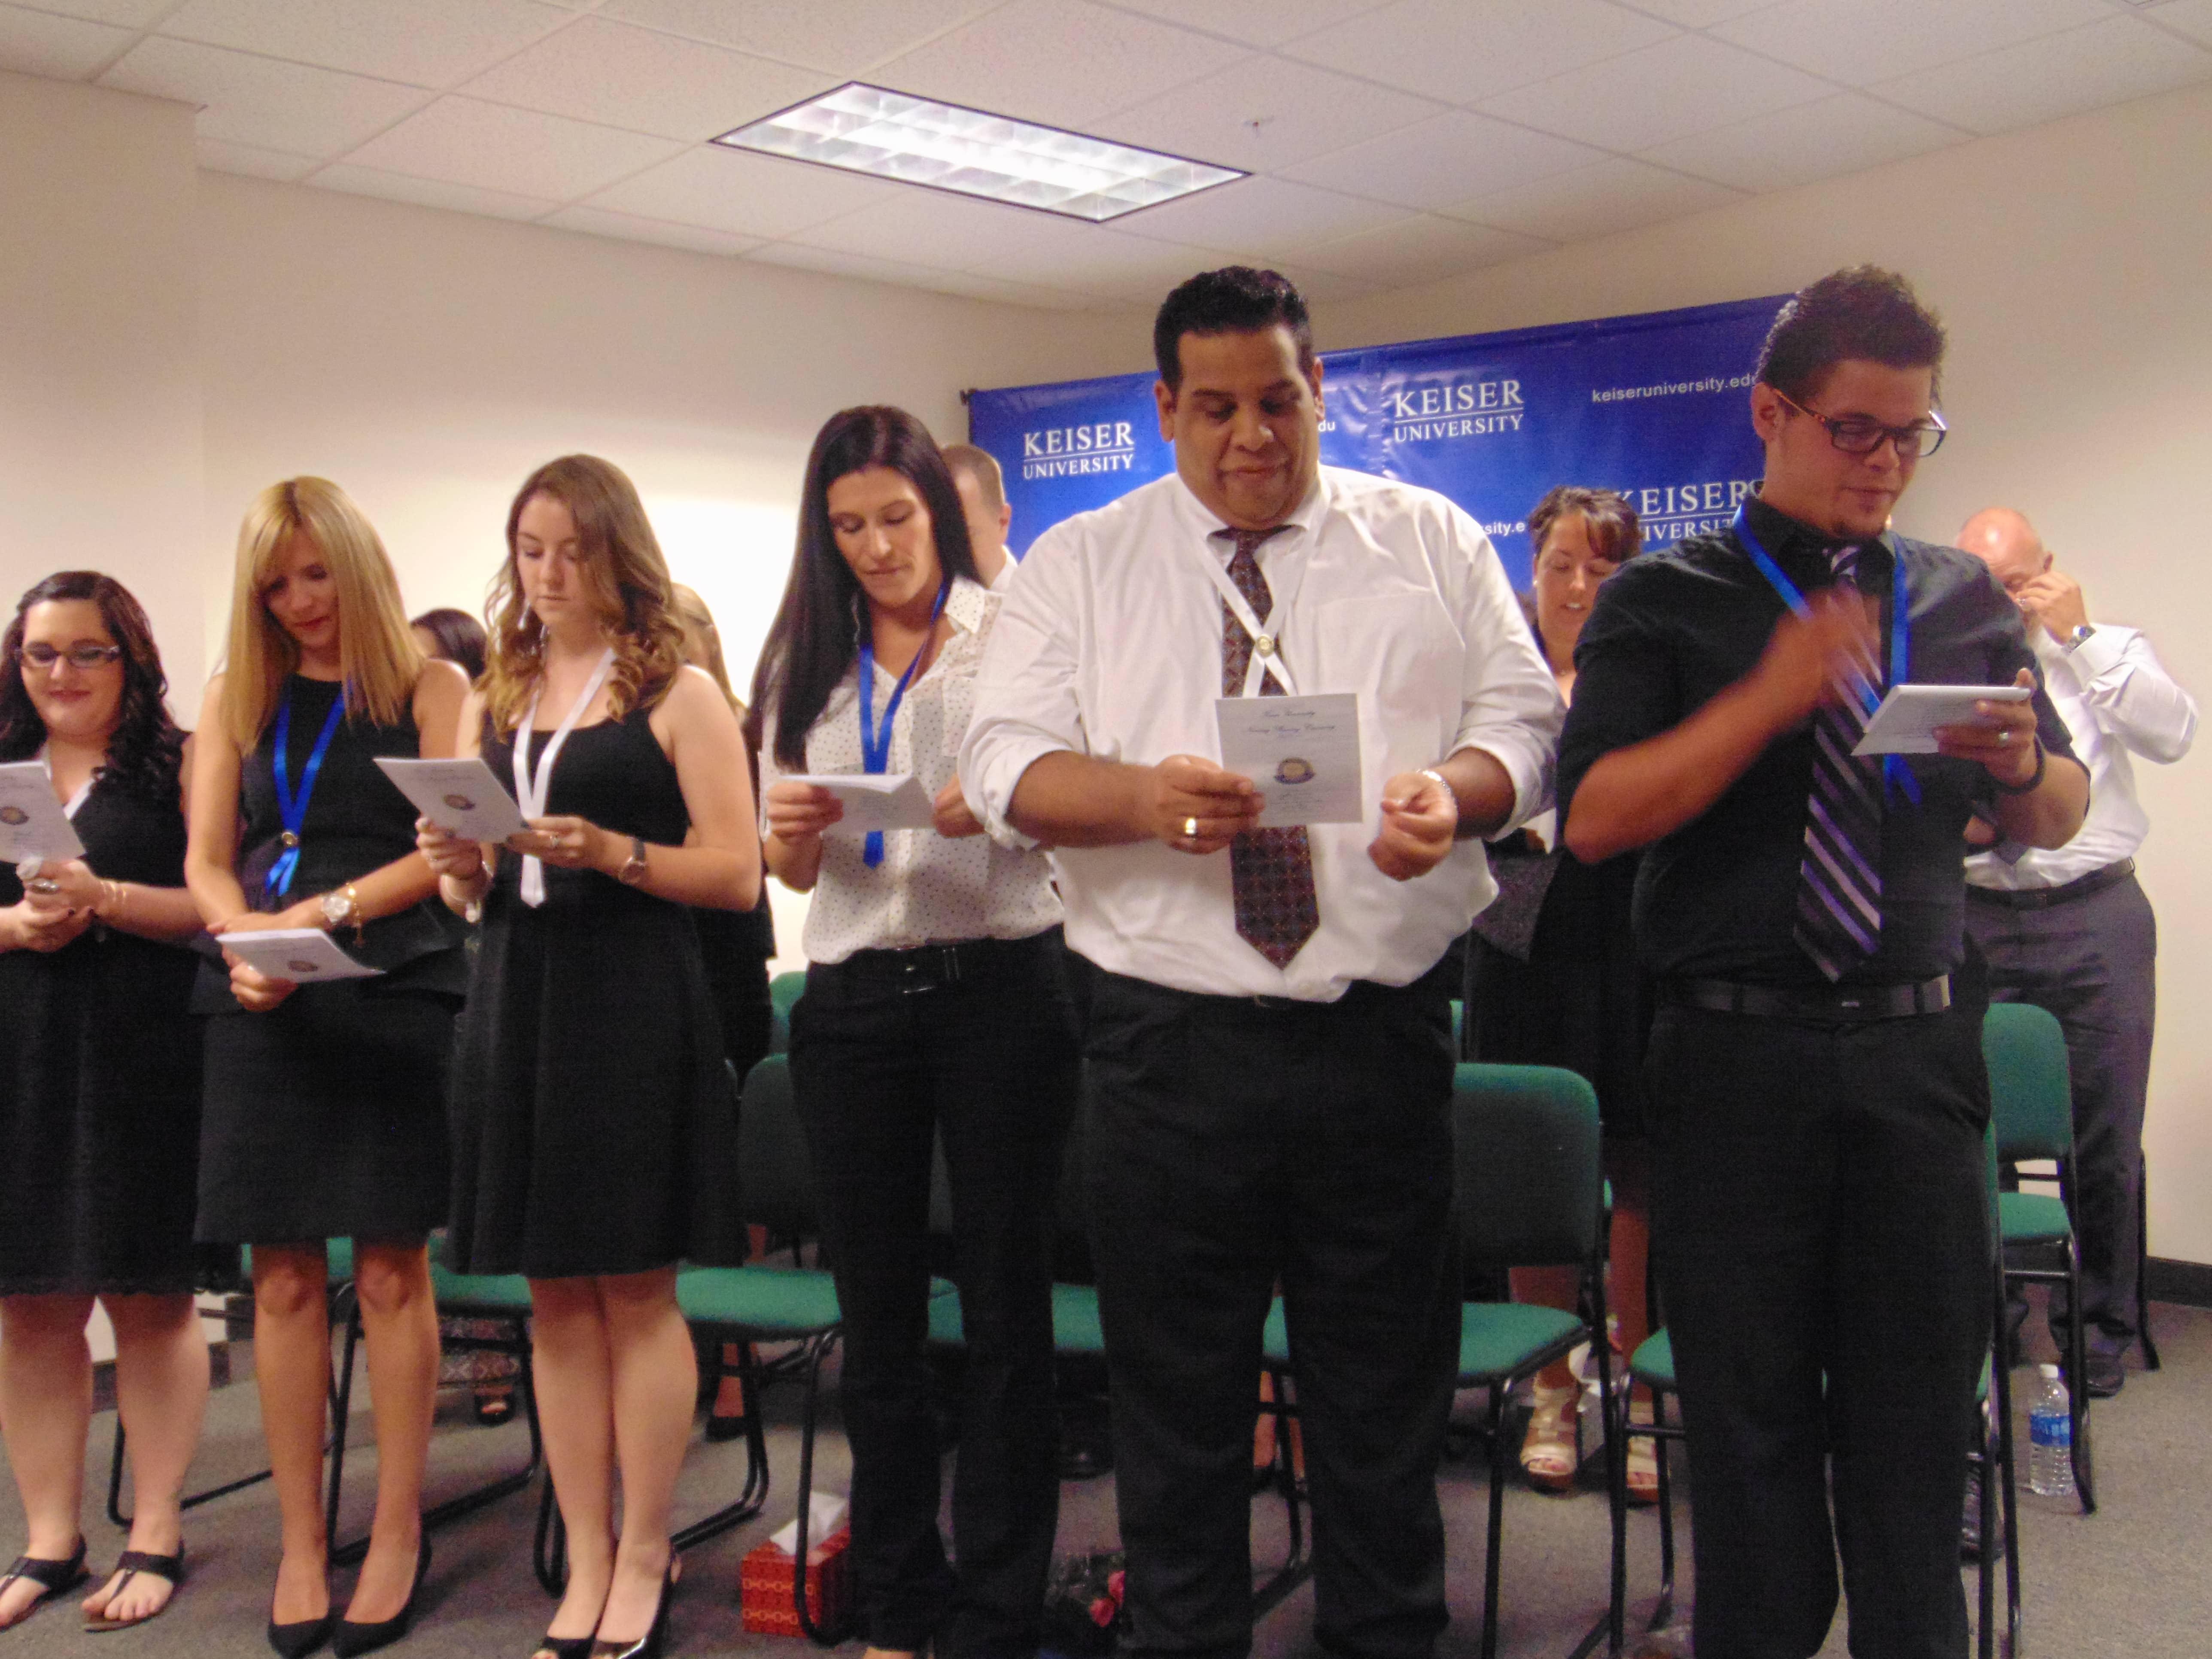 Occupational Therapy Graduate Programs >> Keiser University Pinning Ceremonies - Keiser University